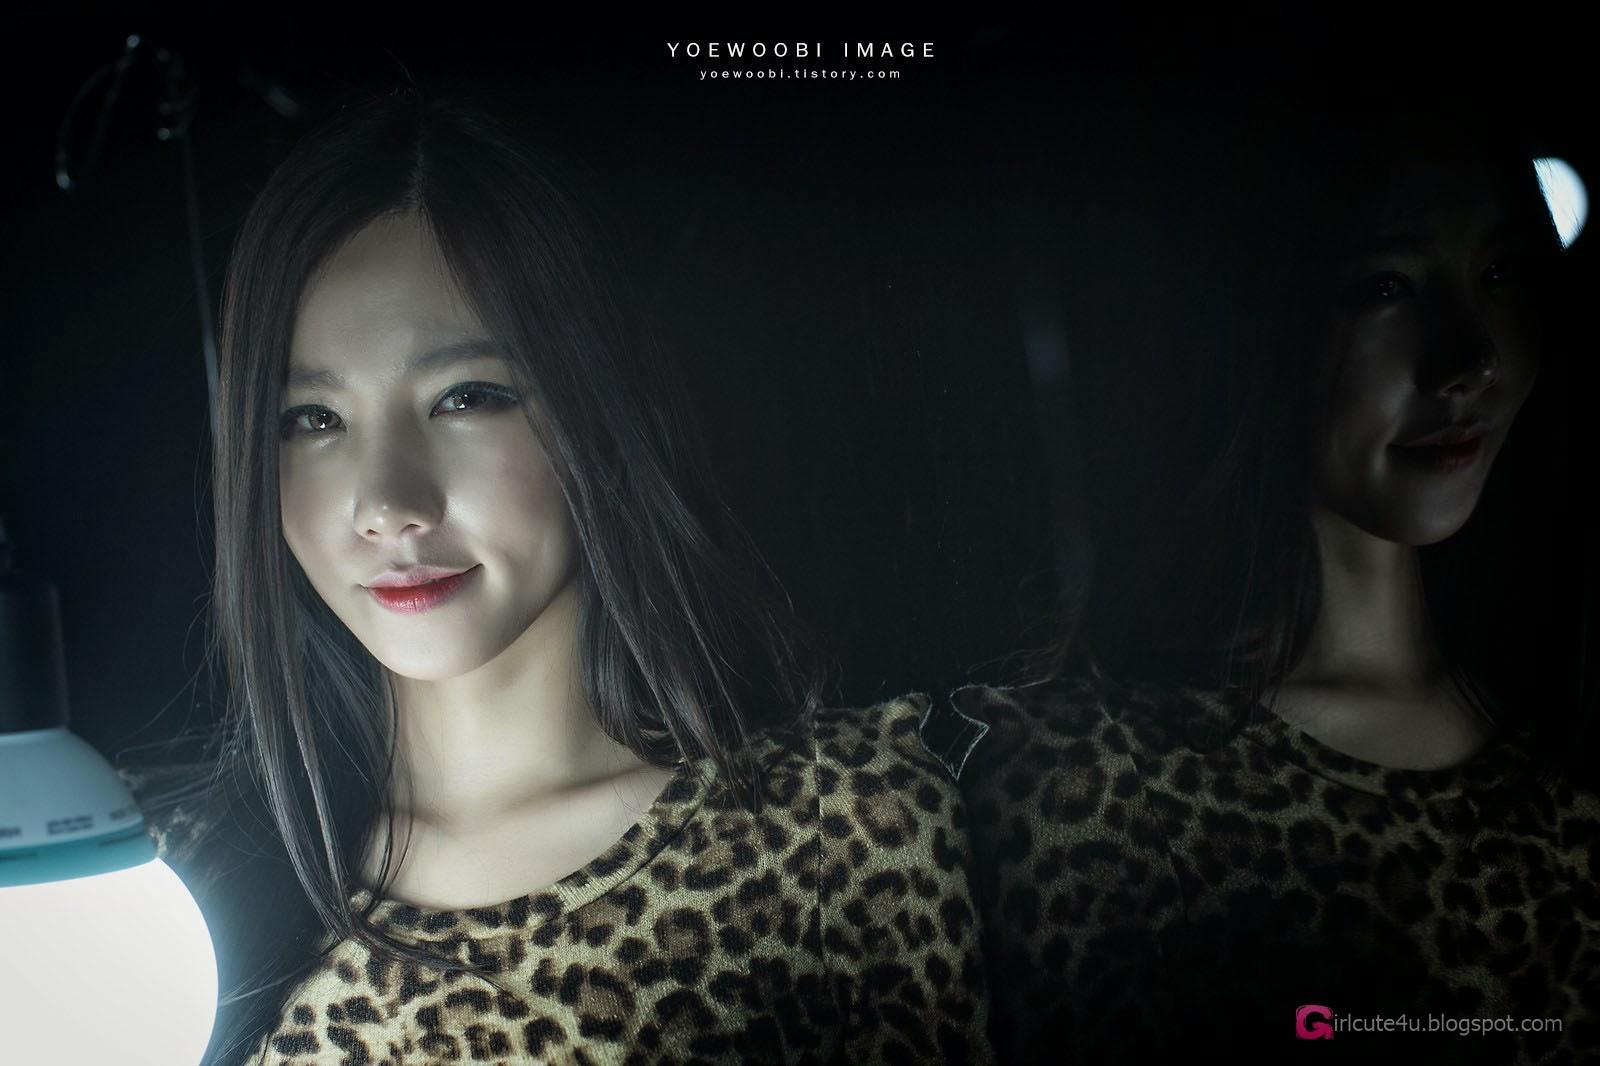 1 Lee Ji Min - very cute asian girl-girlcute4u.blogspot.com